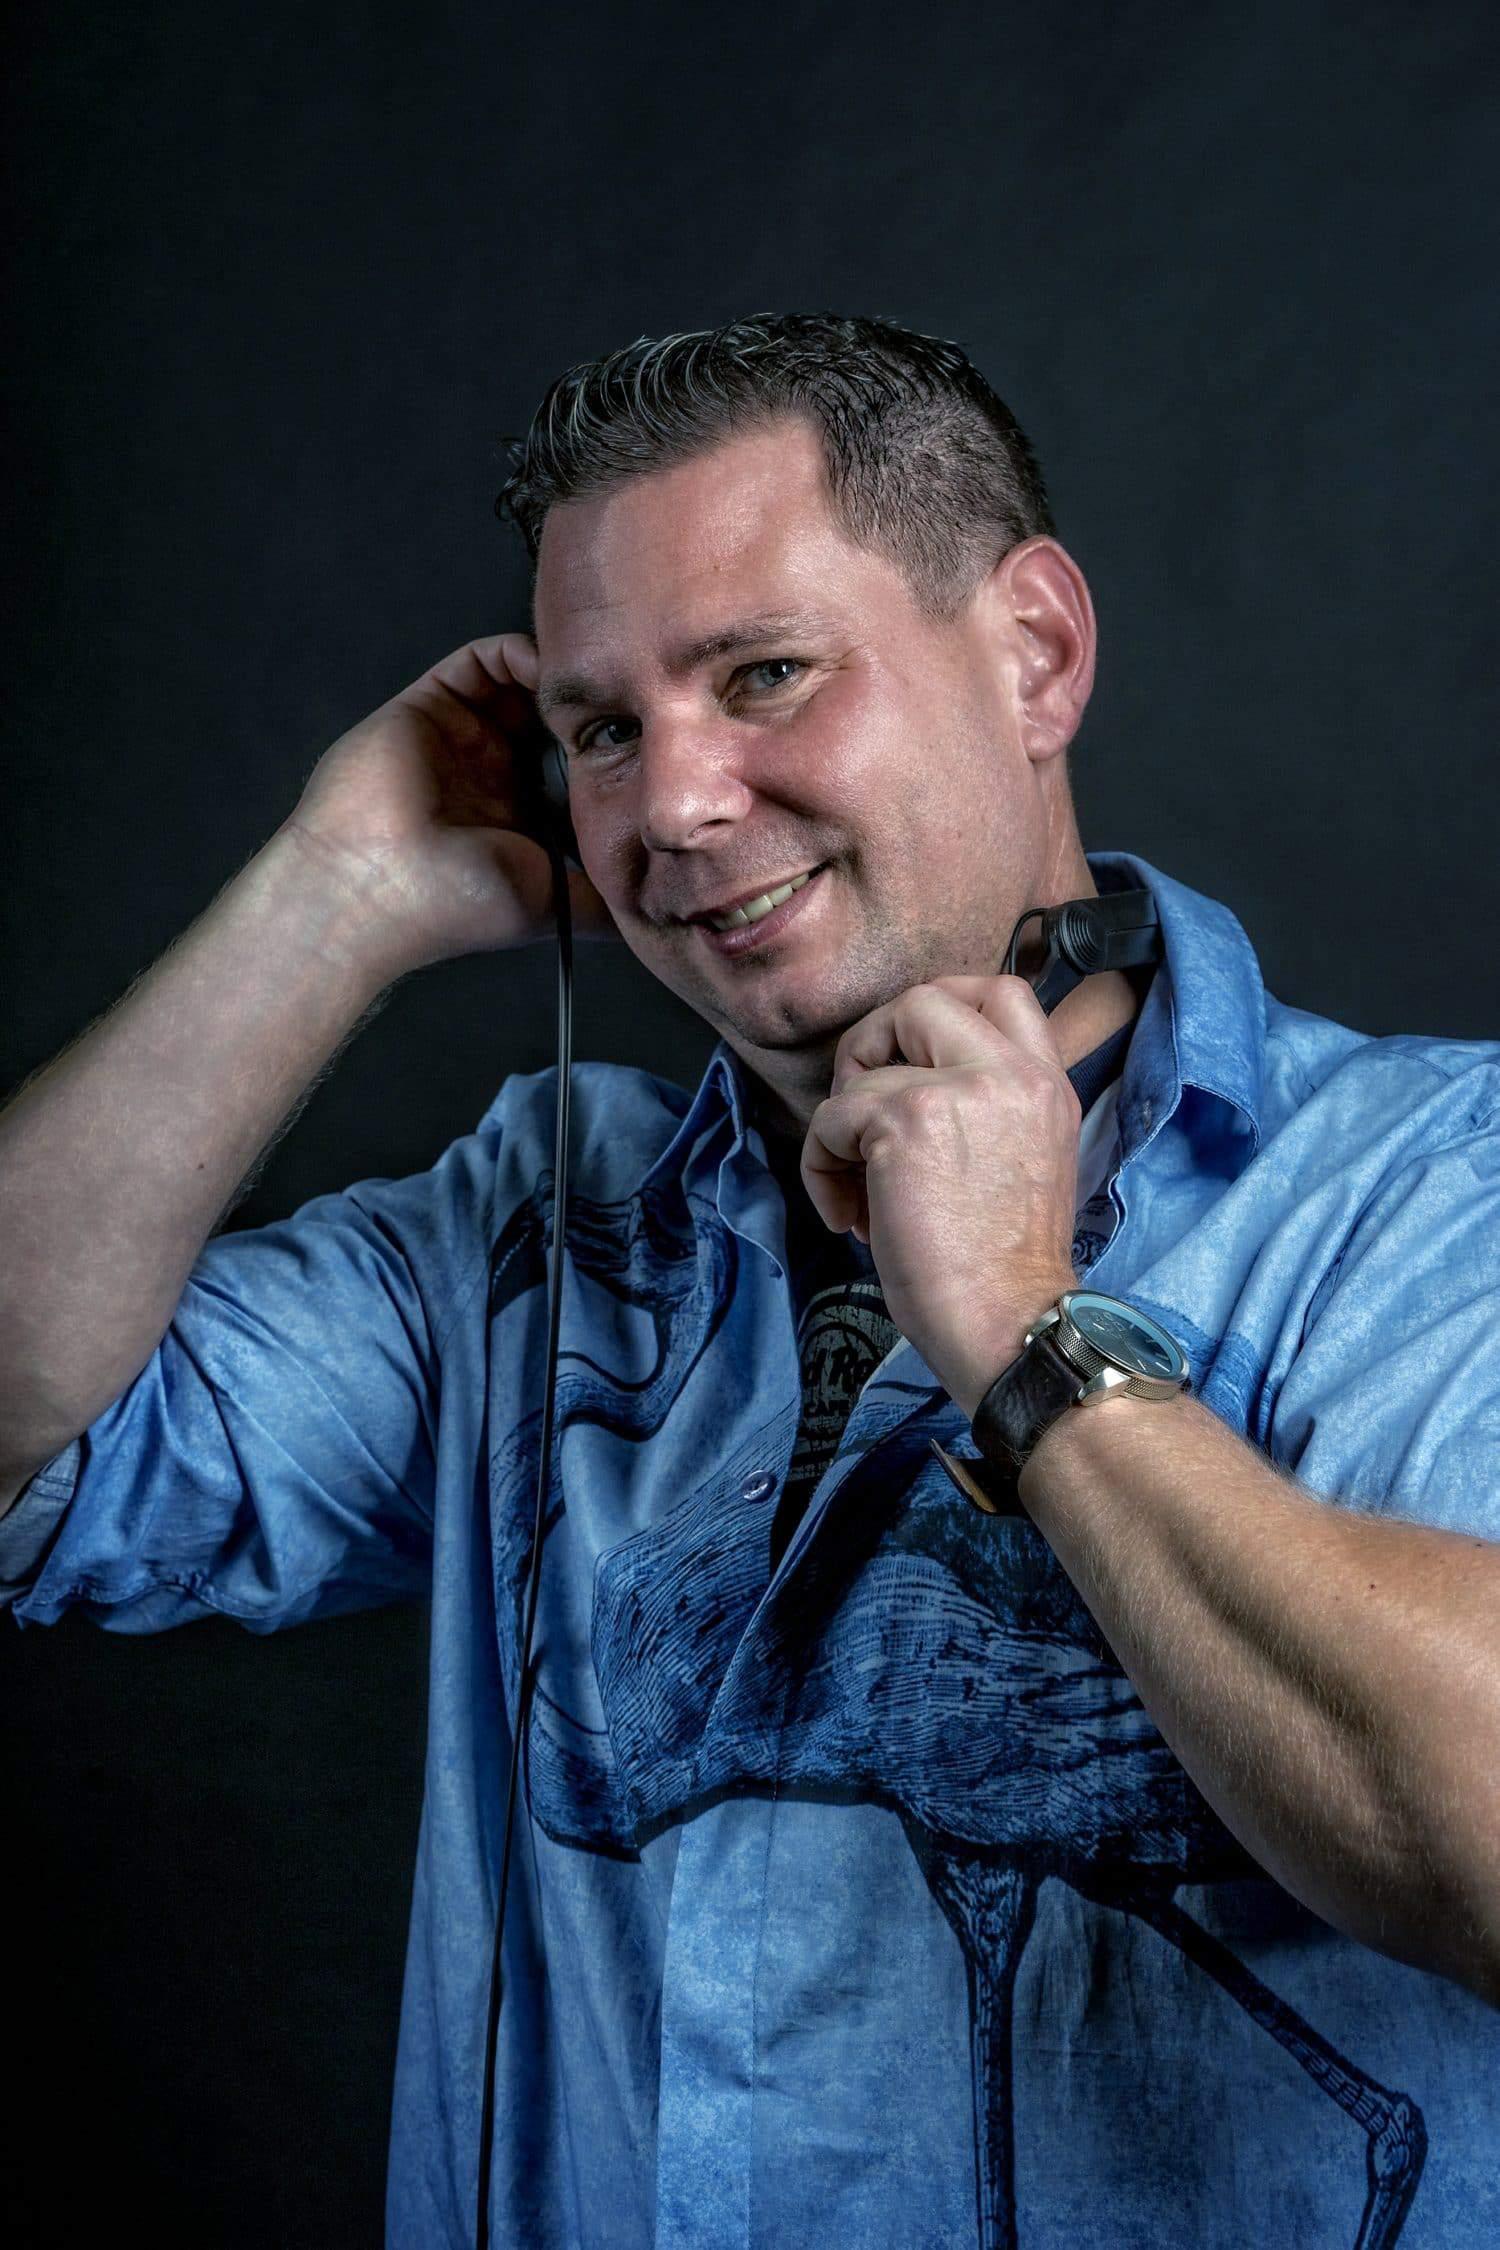 DJ Frank Schwadorf